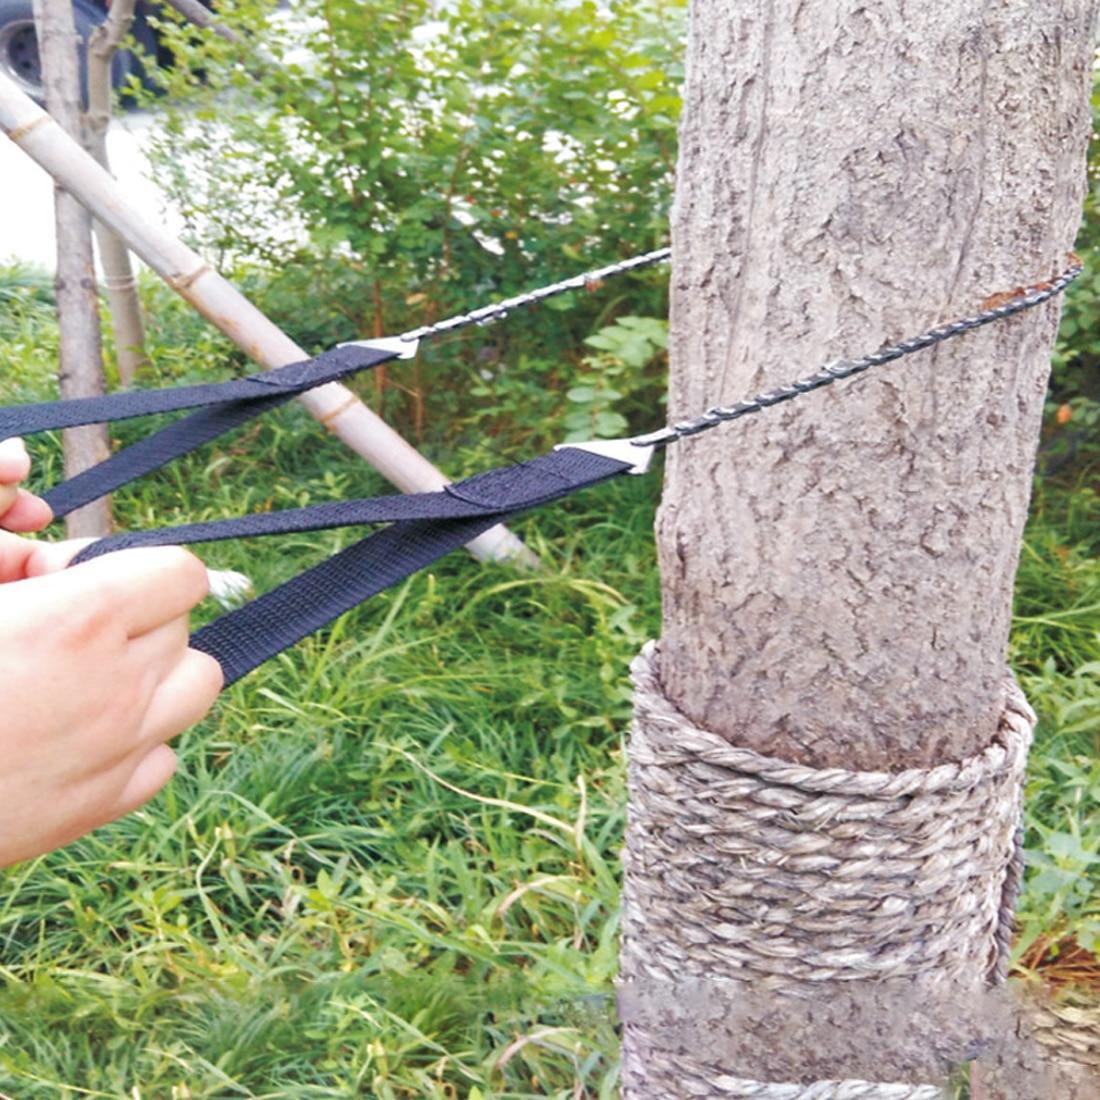 Notfall Haushalt Gartenarbeit Hand Kettensäge Mit Nylon Tasche Outdoor Survival Tasche Kette Sah Hand Kettensäge 63 cm Camping Wandern